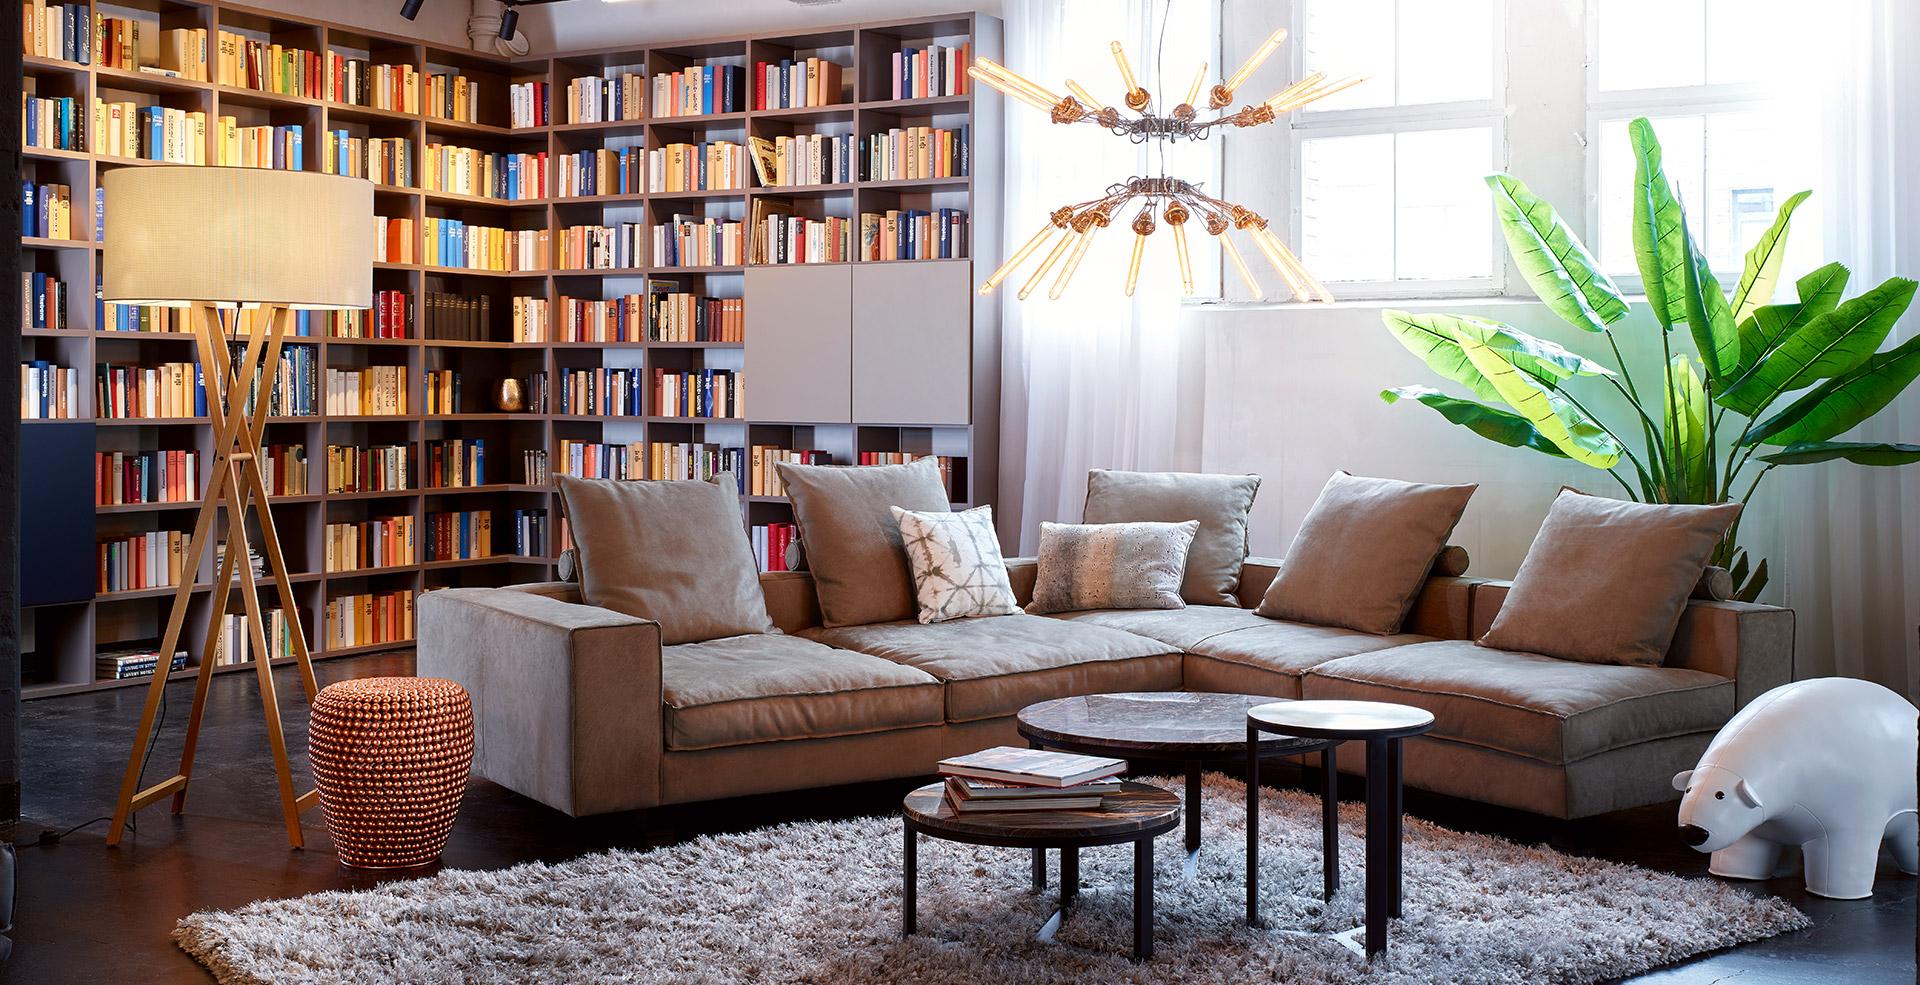 Cozy Leather | KONTRAST - Möbel Leuchten Accessoires